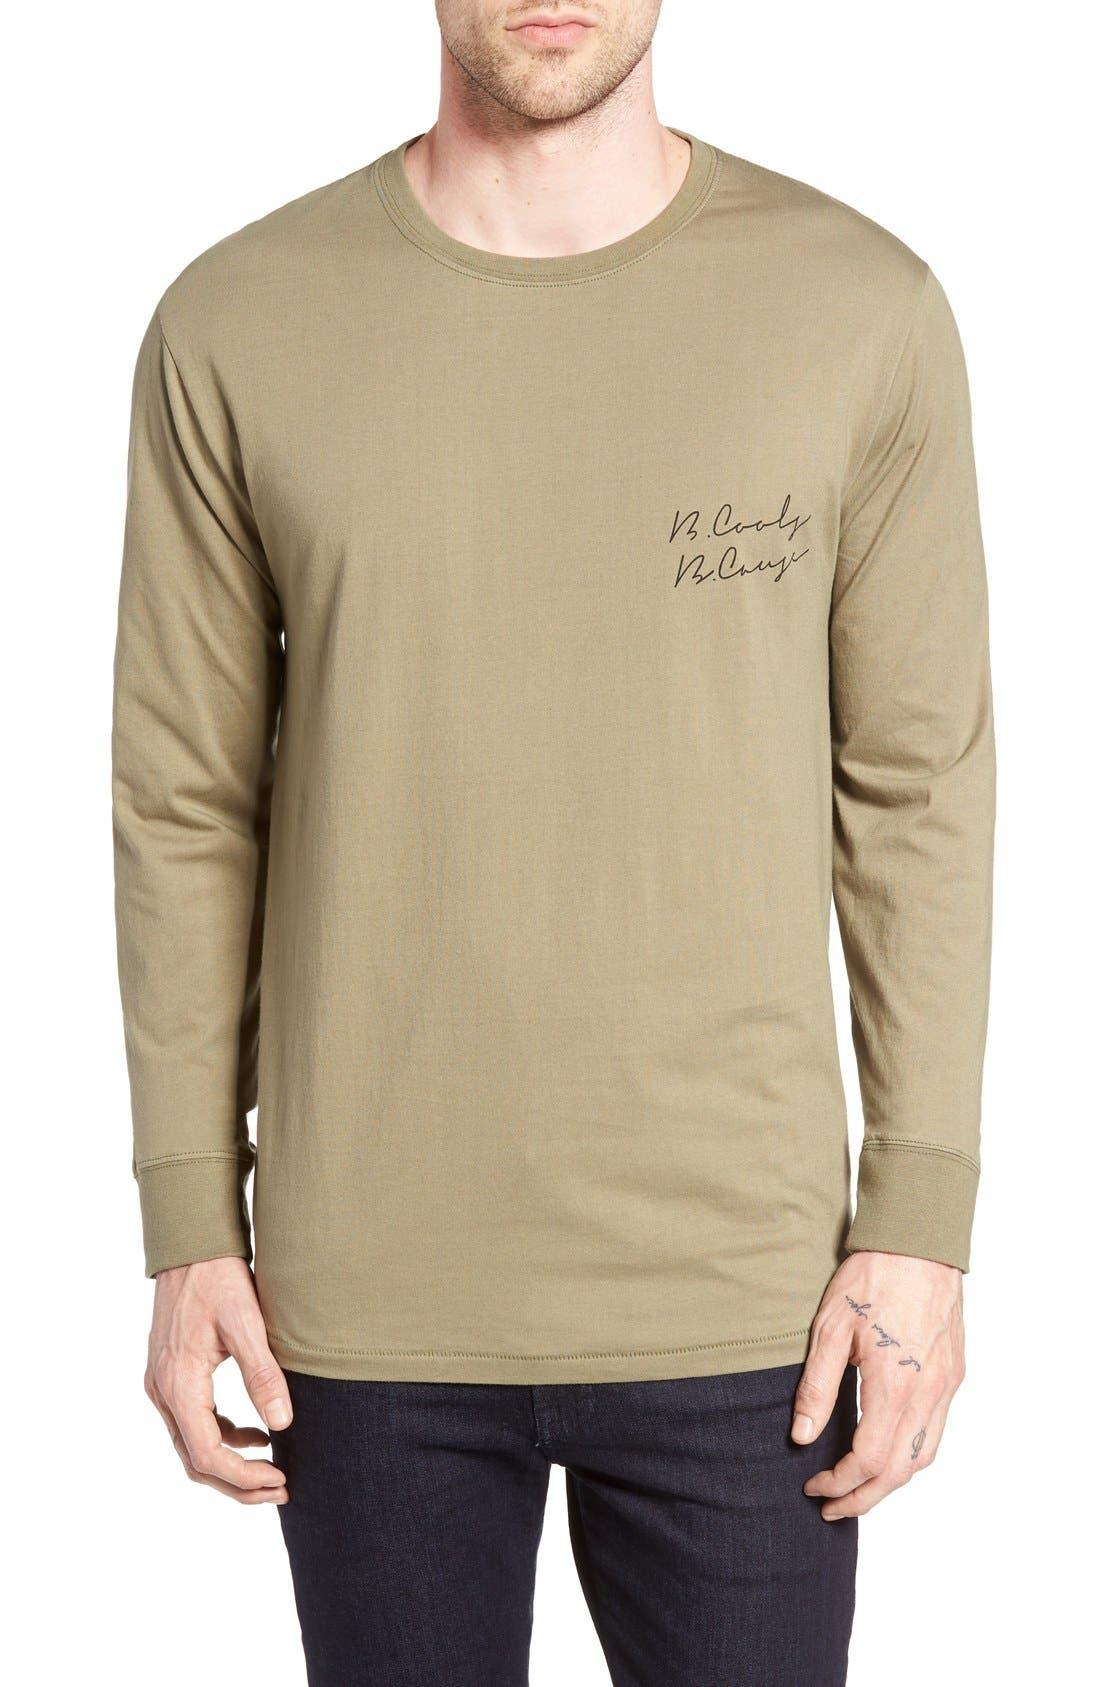 BARNEY COOLS B. Cools B. Cause Graphic T-Shirt